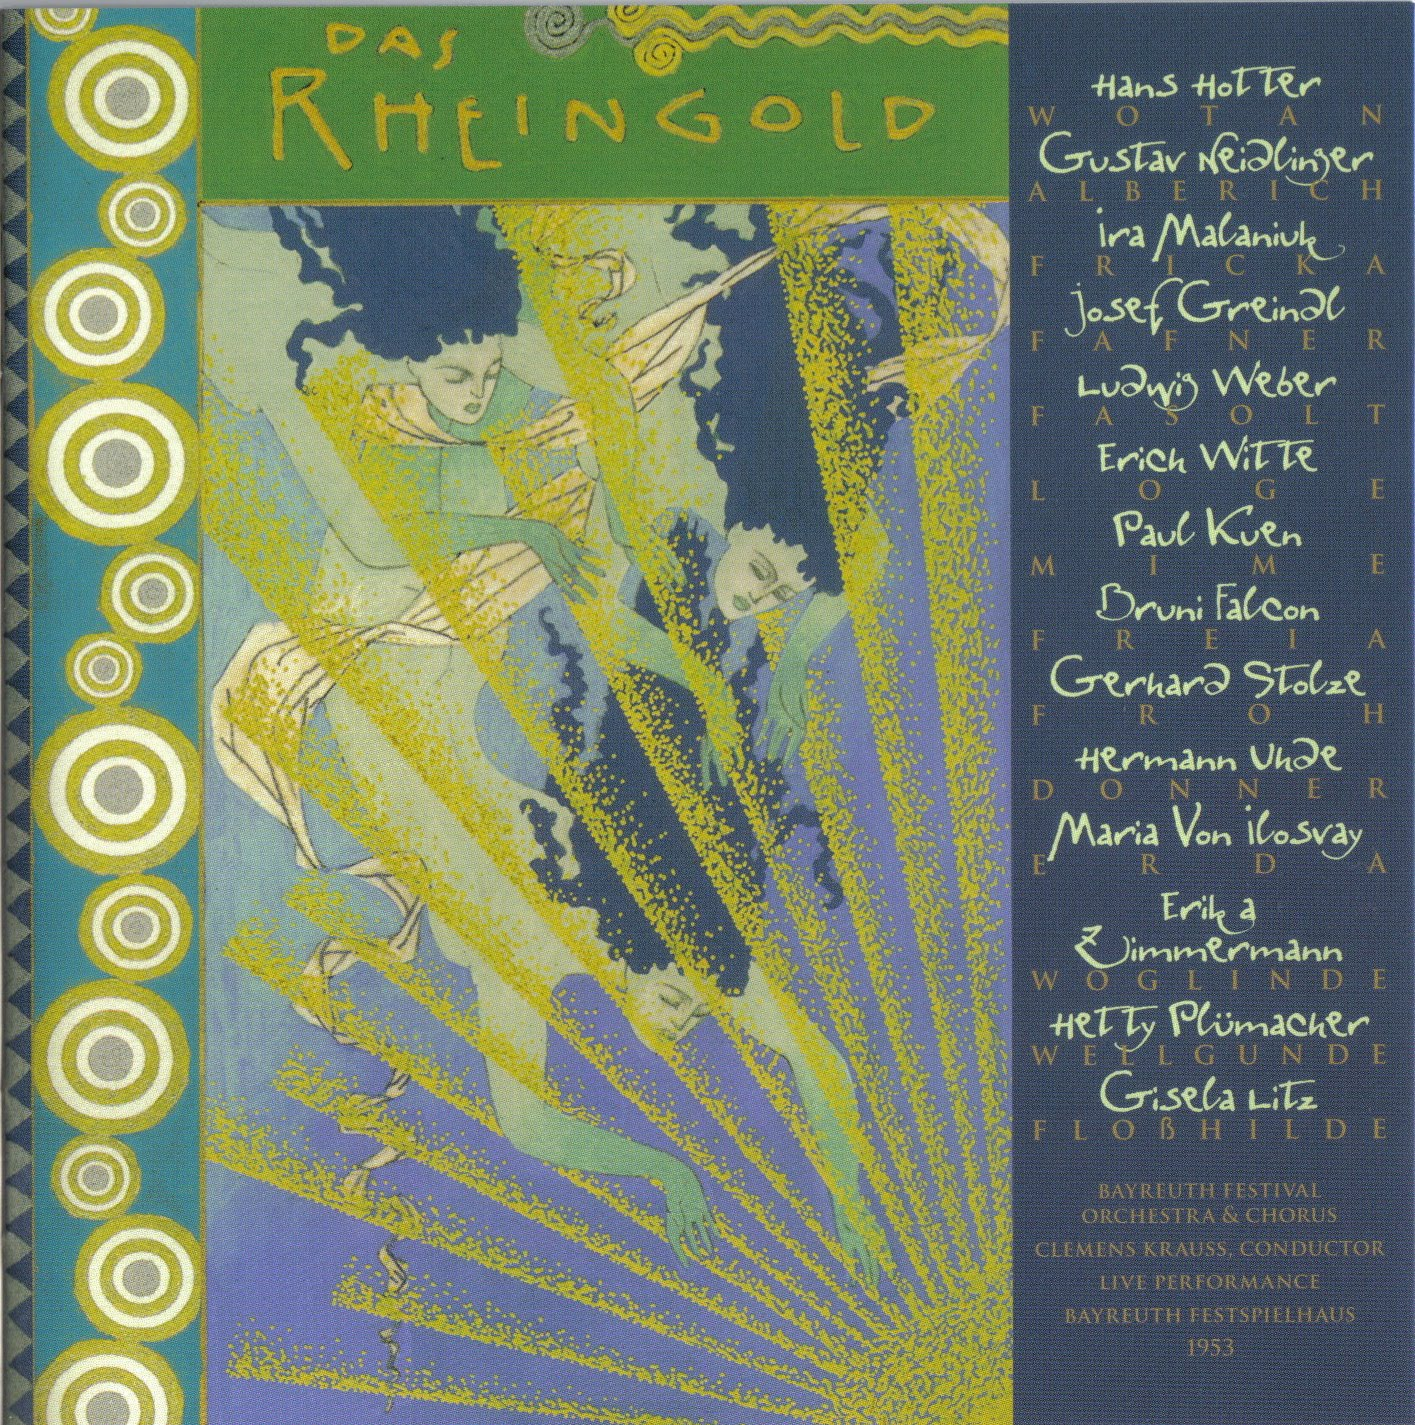 Richard Wagner - Der Ring des Nibelungen (Hans Hotter, Bayreuth 1953) | Das Rheingold (El Oro del Rhin)